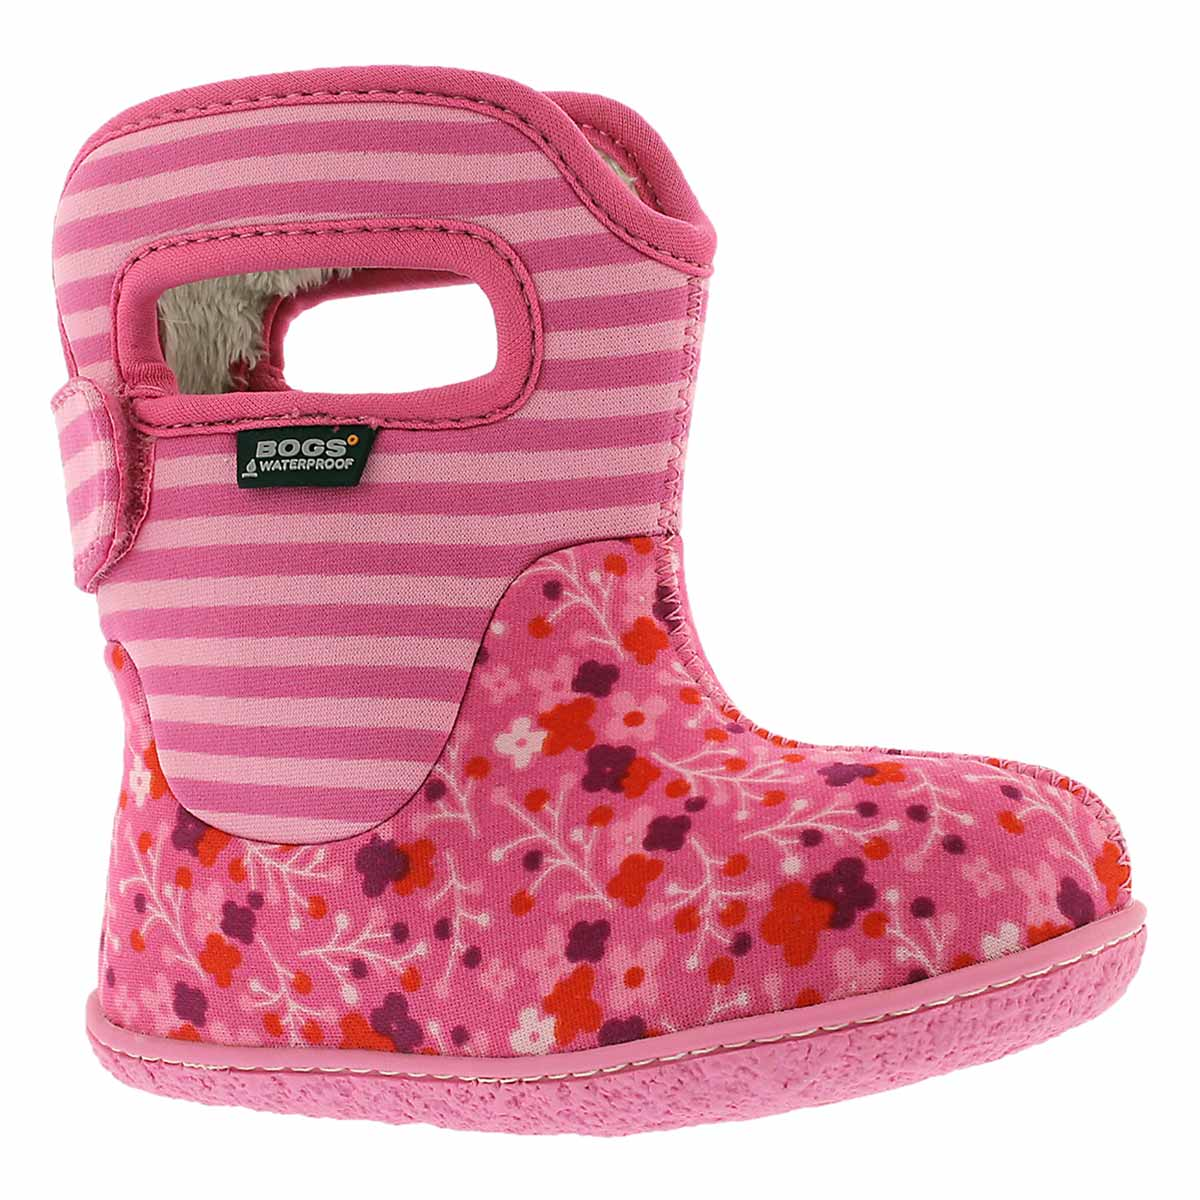 Infs Classic Flower Stripe pnk wntr boot